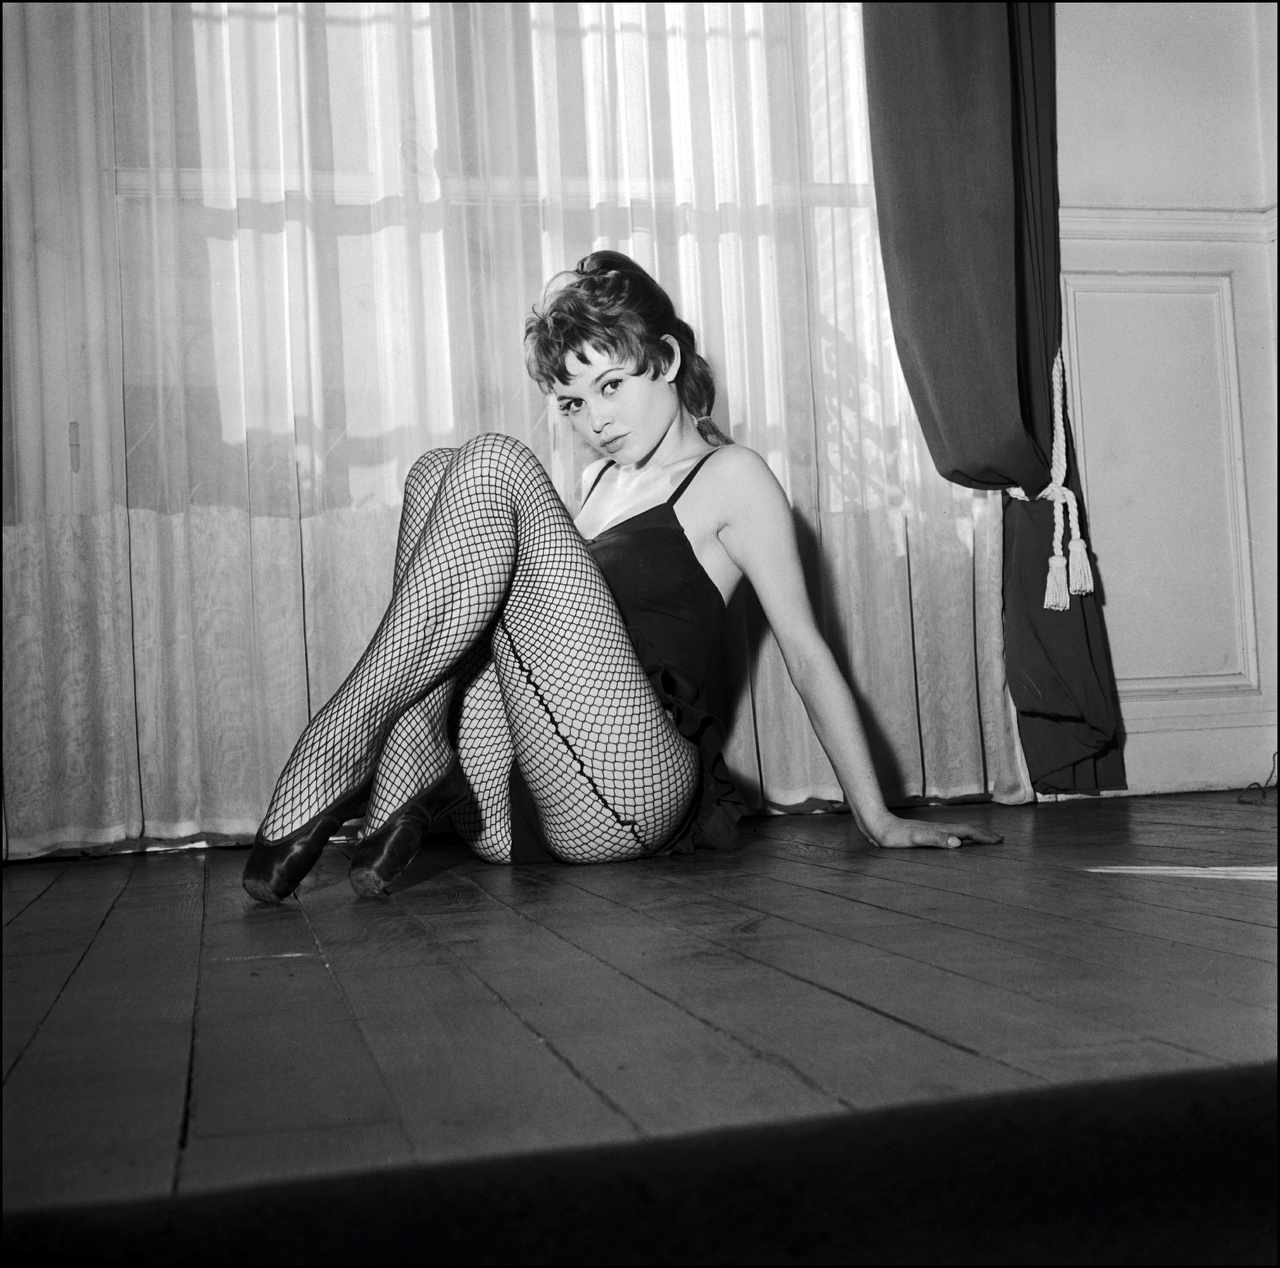 http://4.bp.blogspot.com/_FEkxtl1-FKs/THMAY7DrqFI/AAAAAAAAALg/M8imepj5oQc/s1600/Brigitte+Bardot_%27.jpg